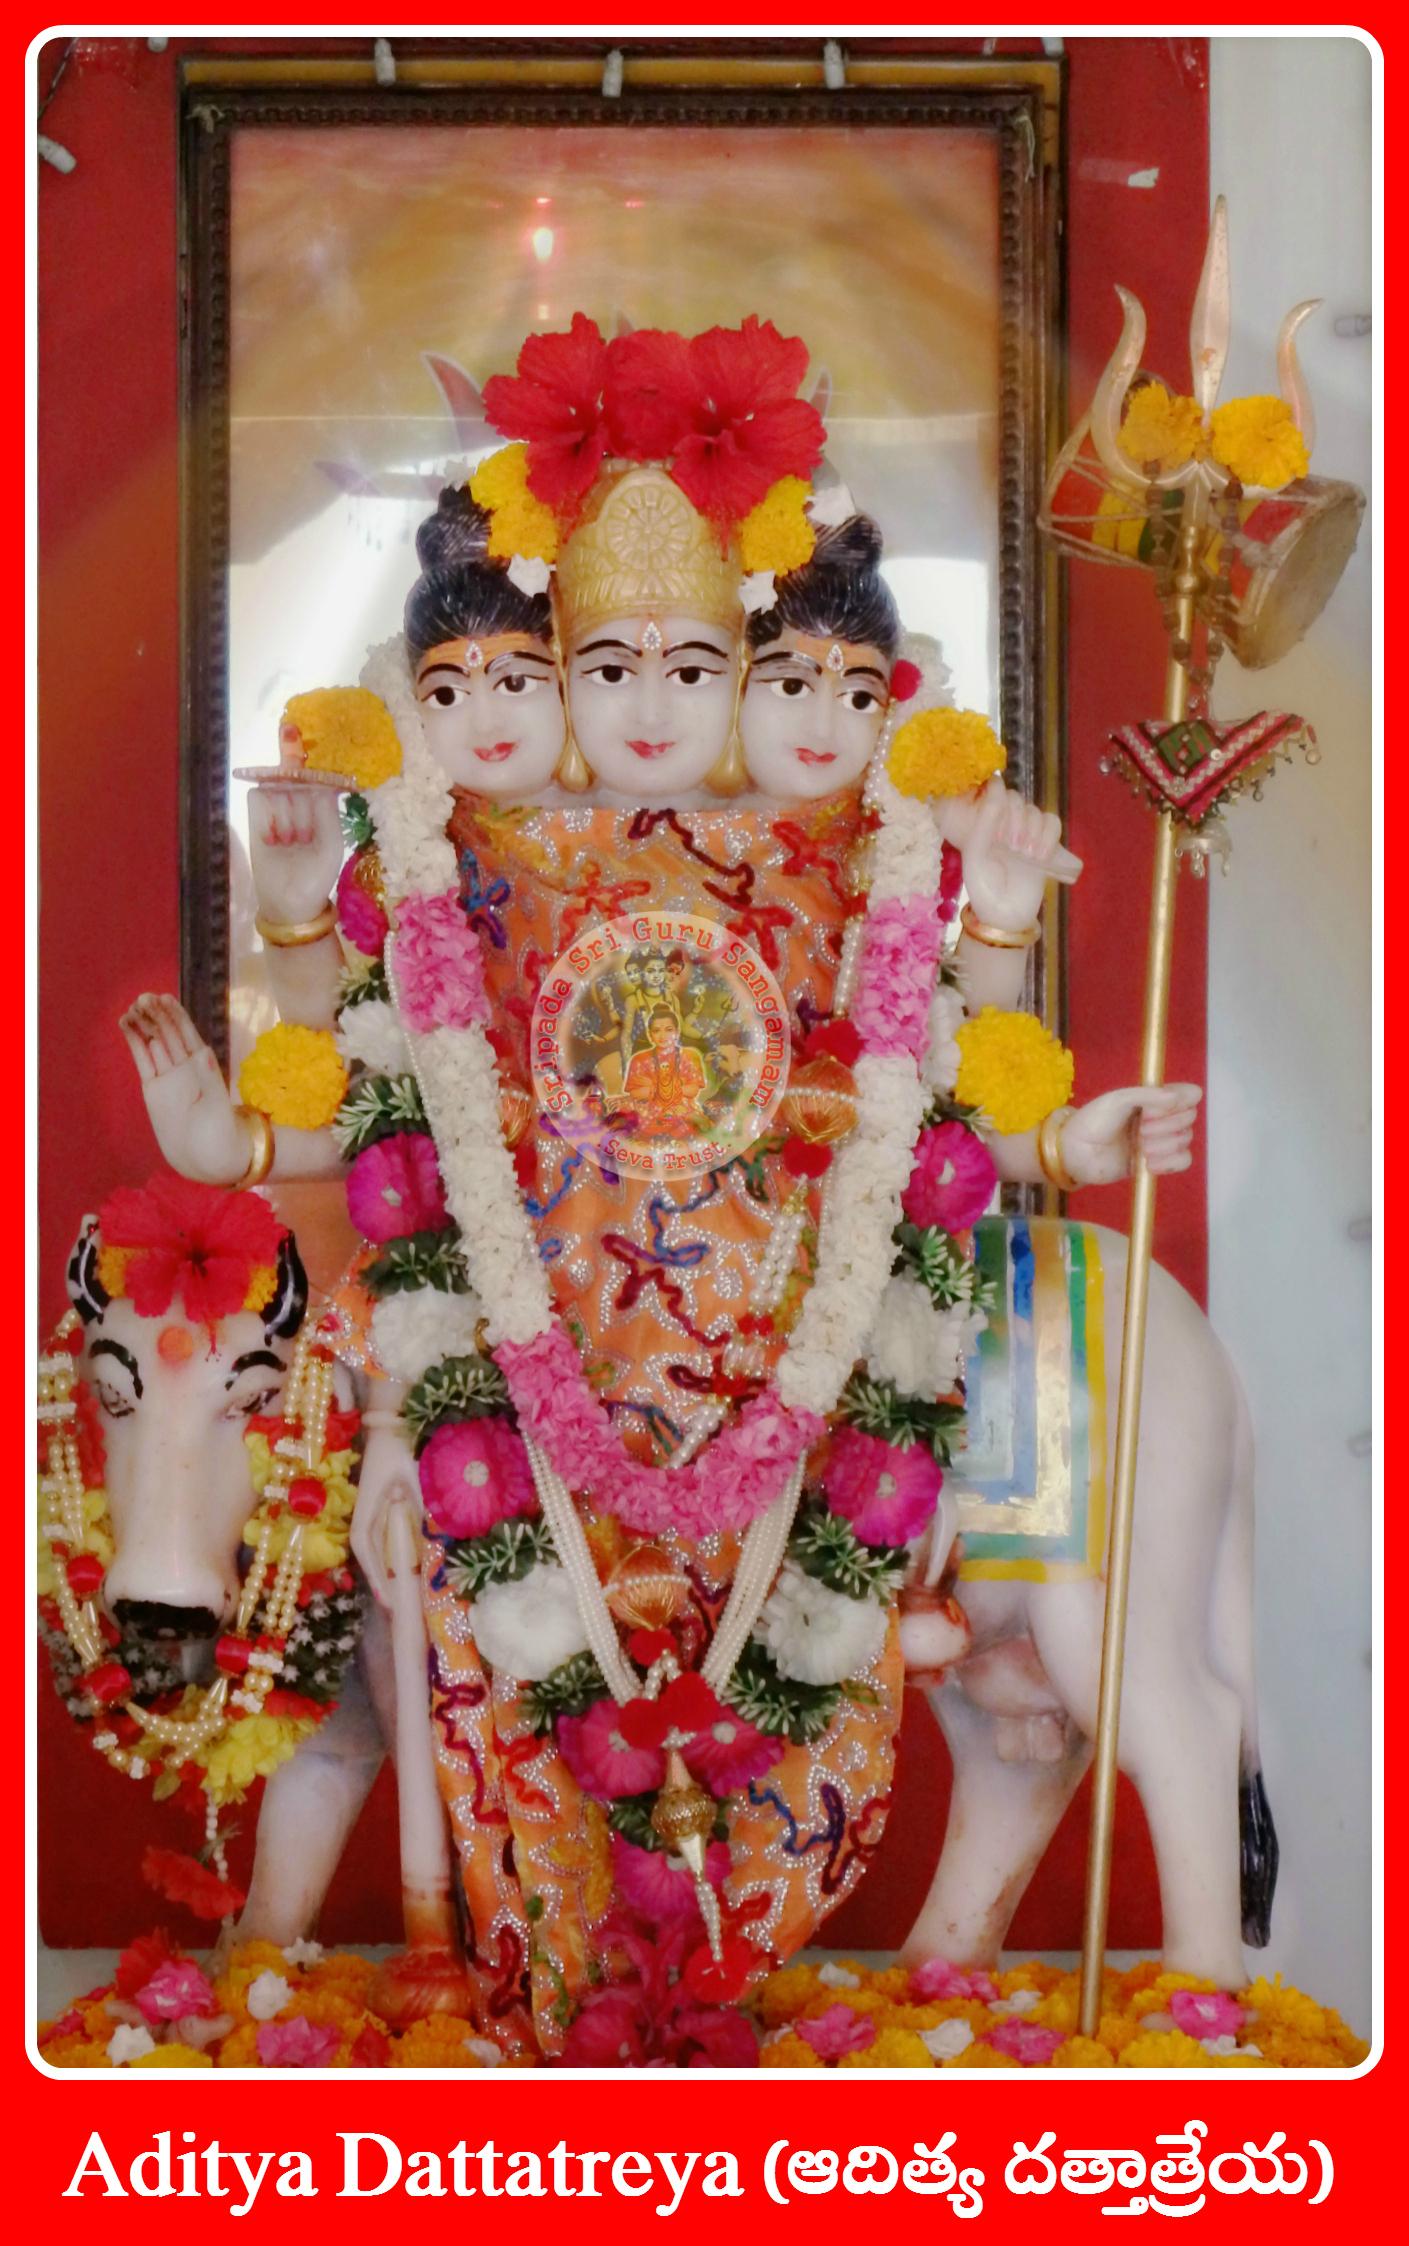 Paschim Pit Aditya Dattatreya At Kaladungar, Near Indo-Pak Border, Great Rannof Kutch